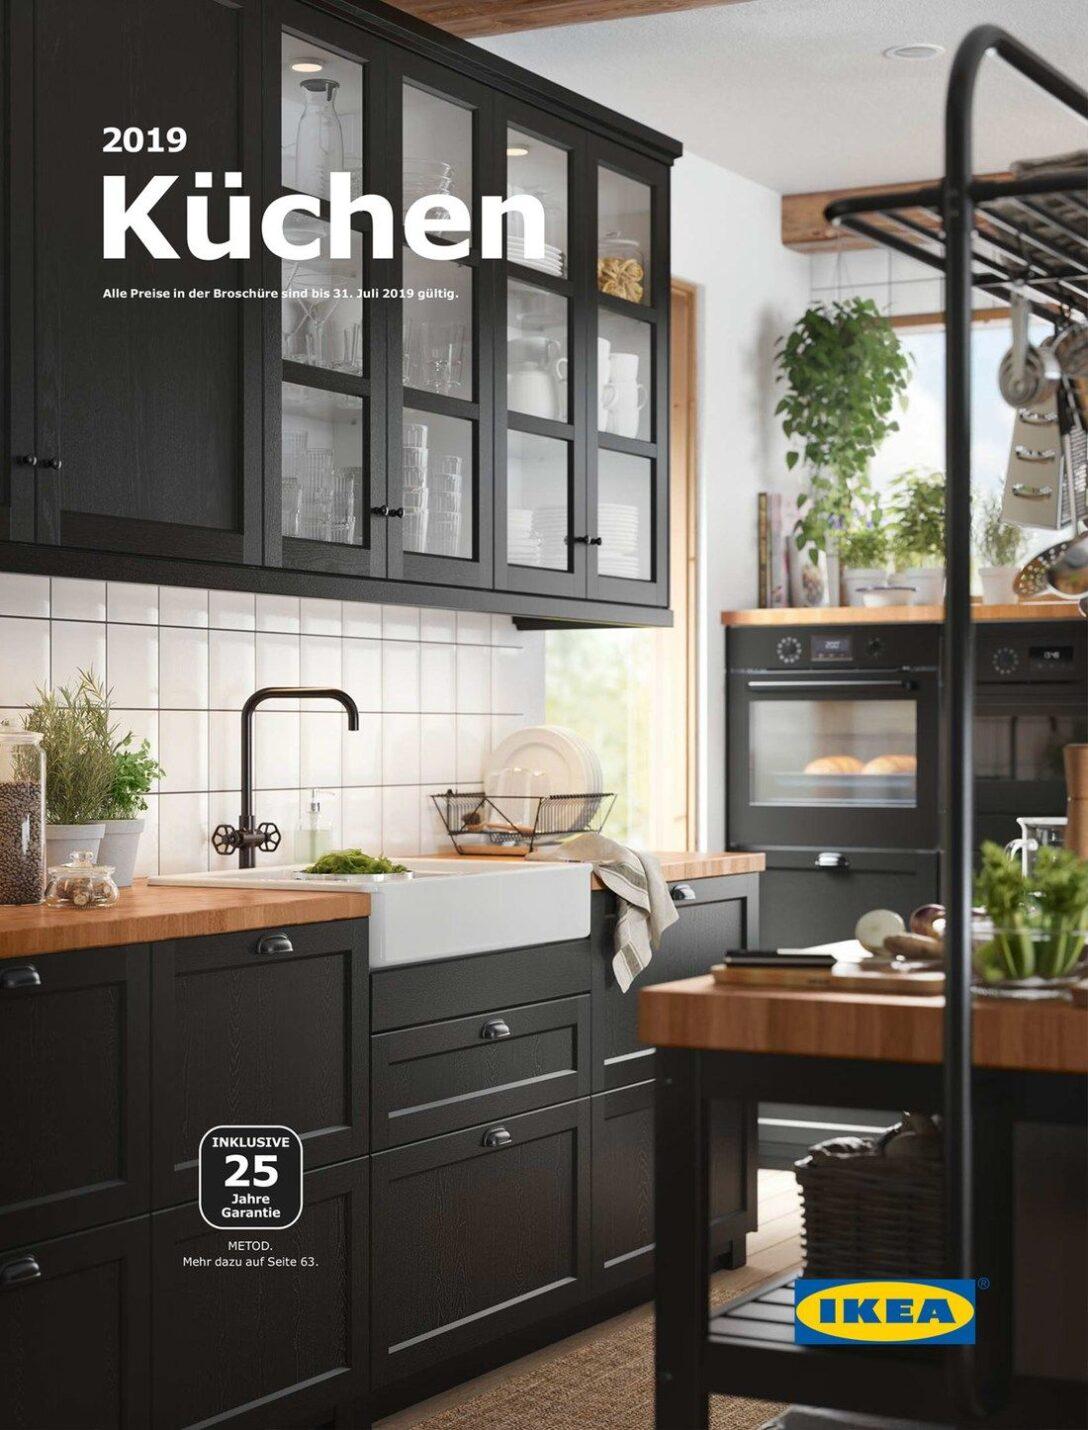 Large Size of Ikea Küche Katalog Fr 2020 Kchen Design Bodenbeläge Raffrollo Outdoor Edelstahl Doppel Mülleimer Eckküche Mit Elektrogeräten Wandregal Keramik Waschbecken Wohnzimmer Ikea Küche